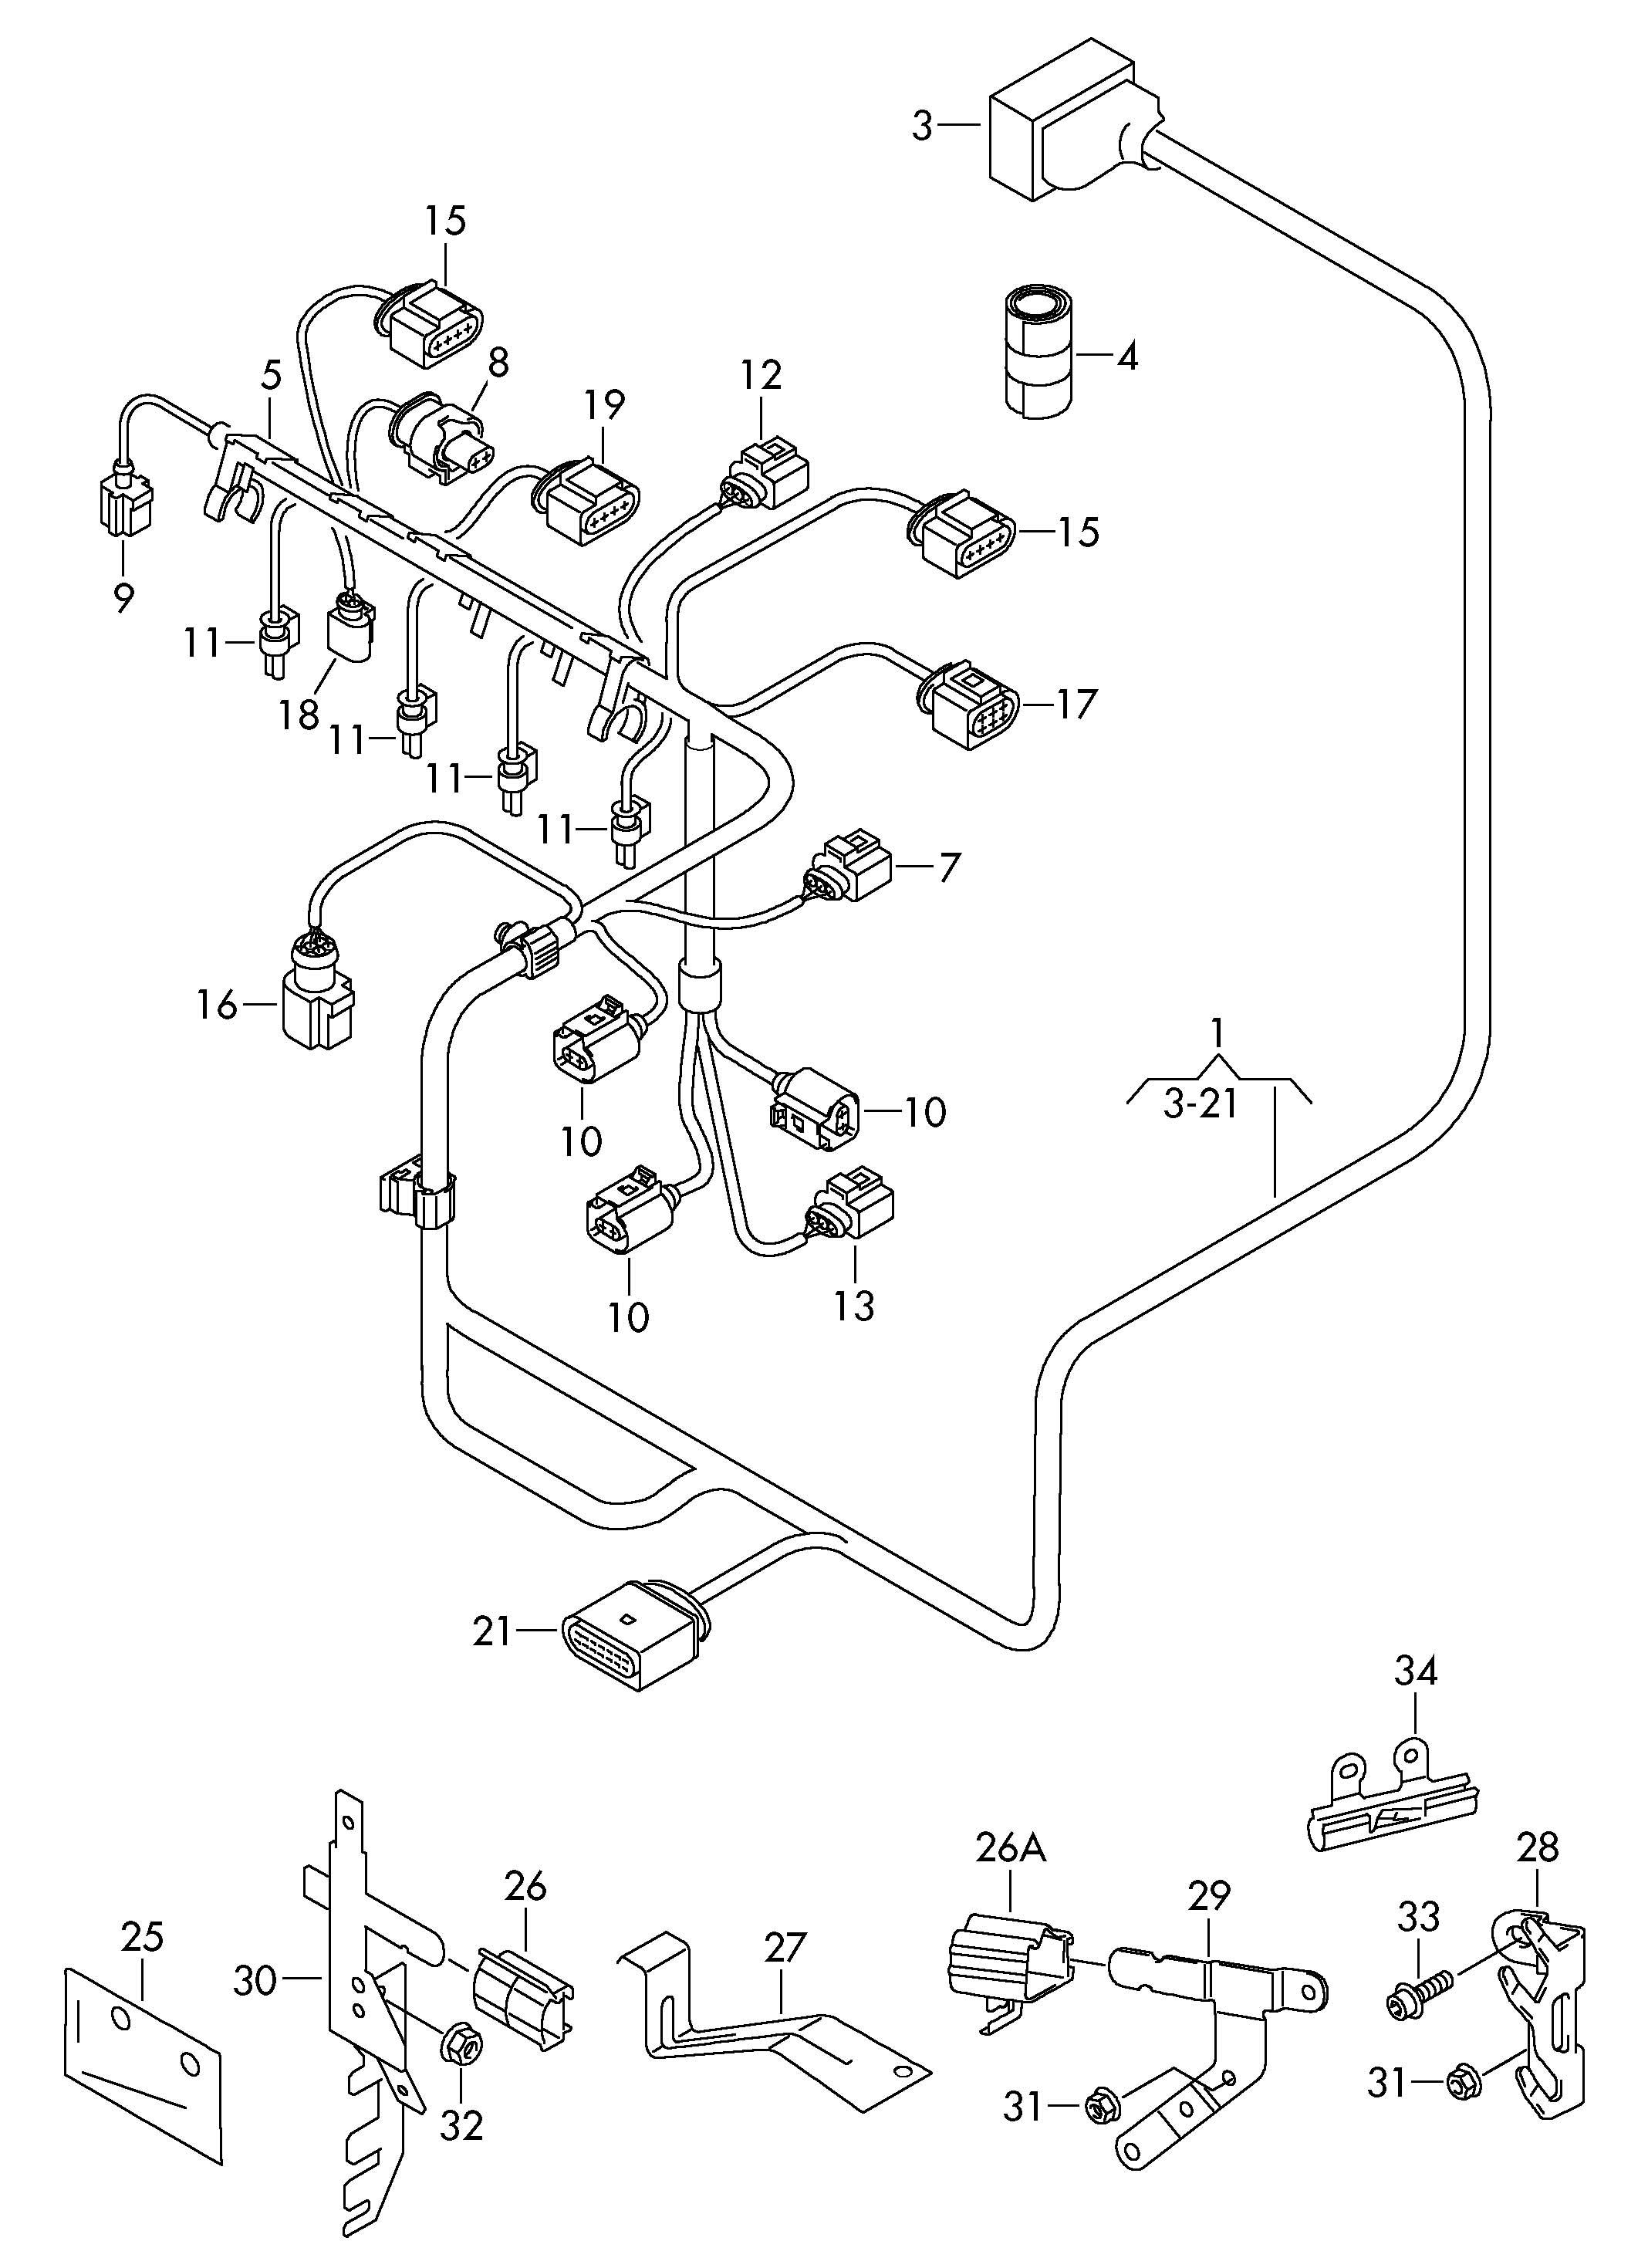 mk1 golf gti fuel pump wiring diagram 1994 jeep cherokee sport radio 81 volkswagen rabbit harness auto